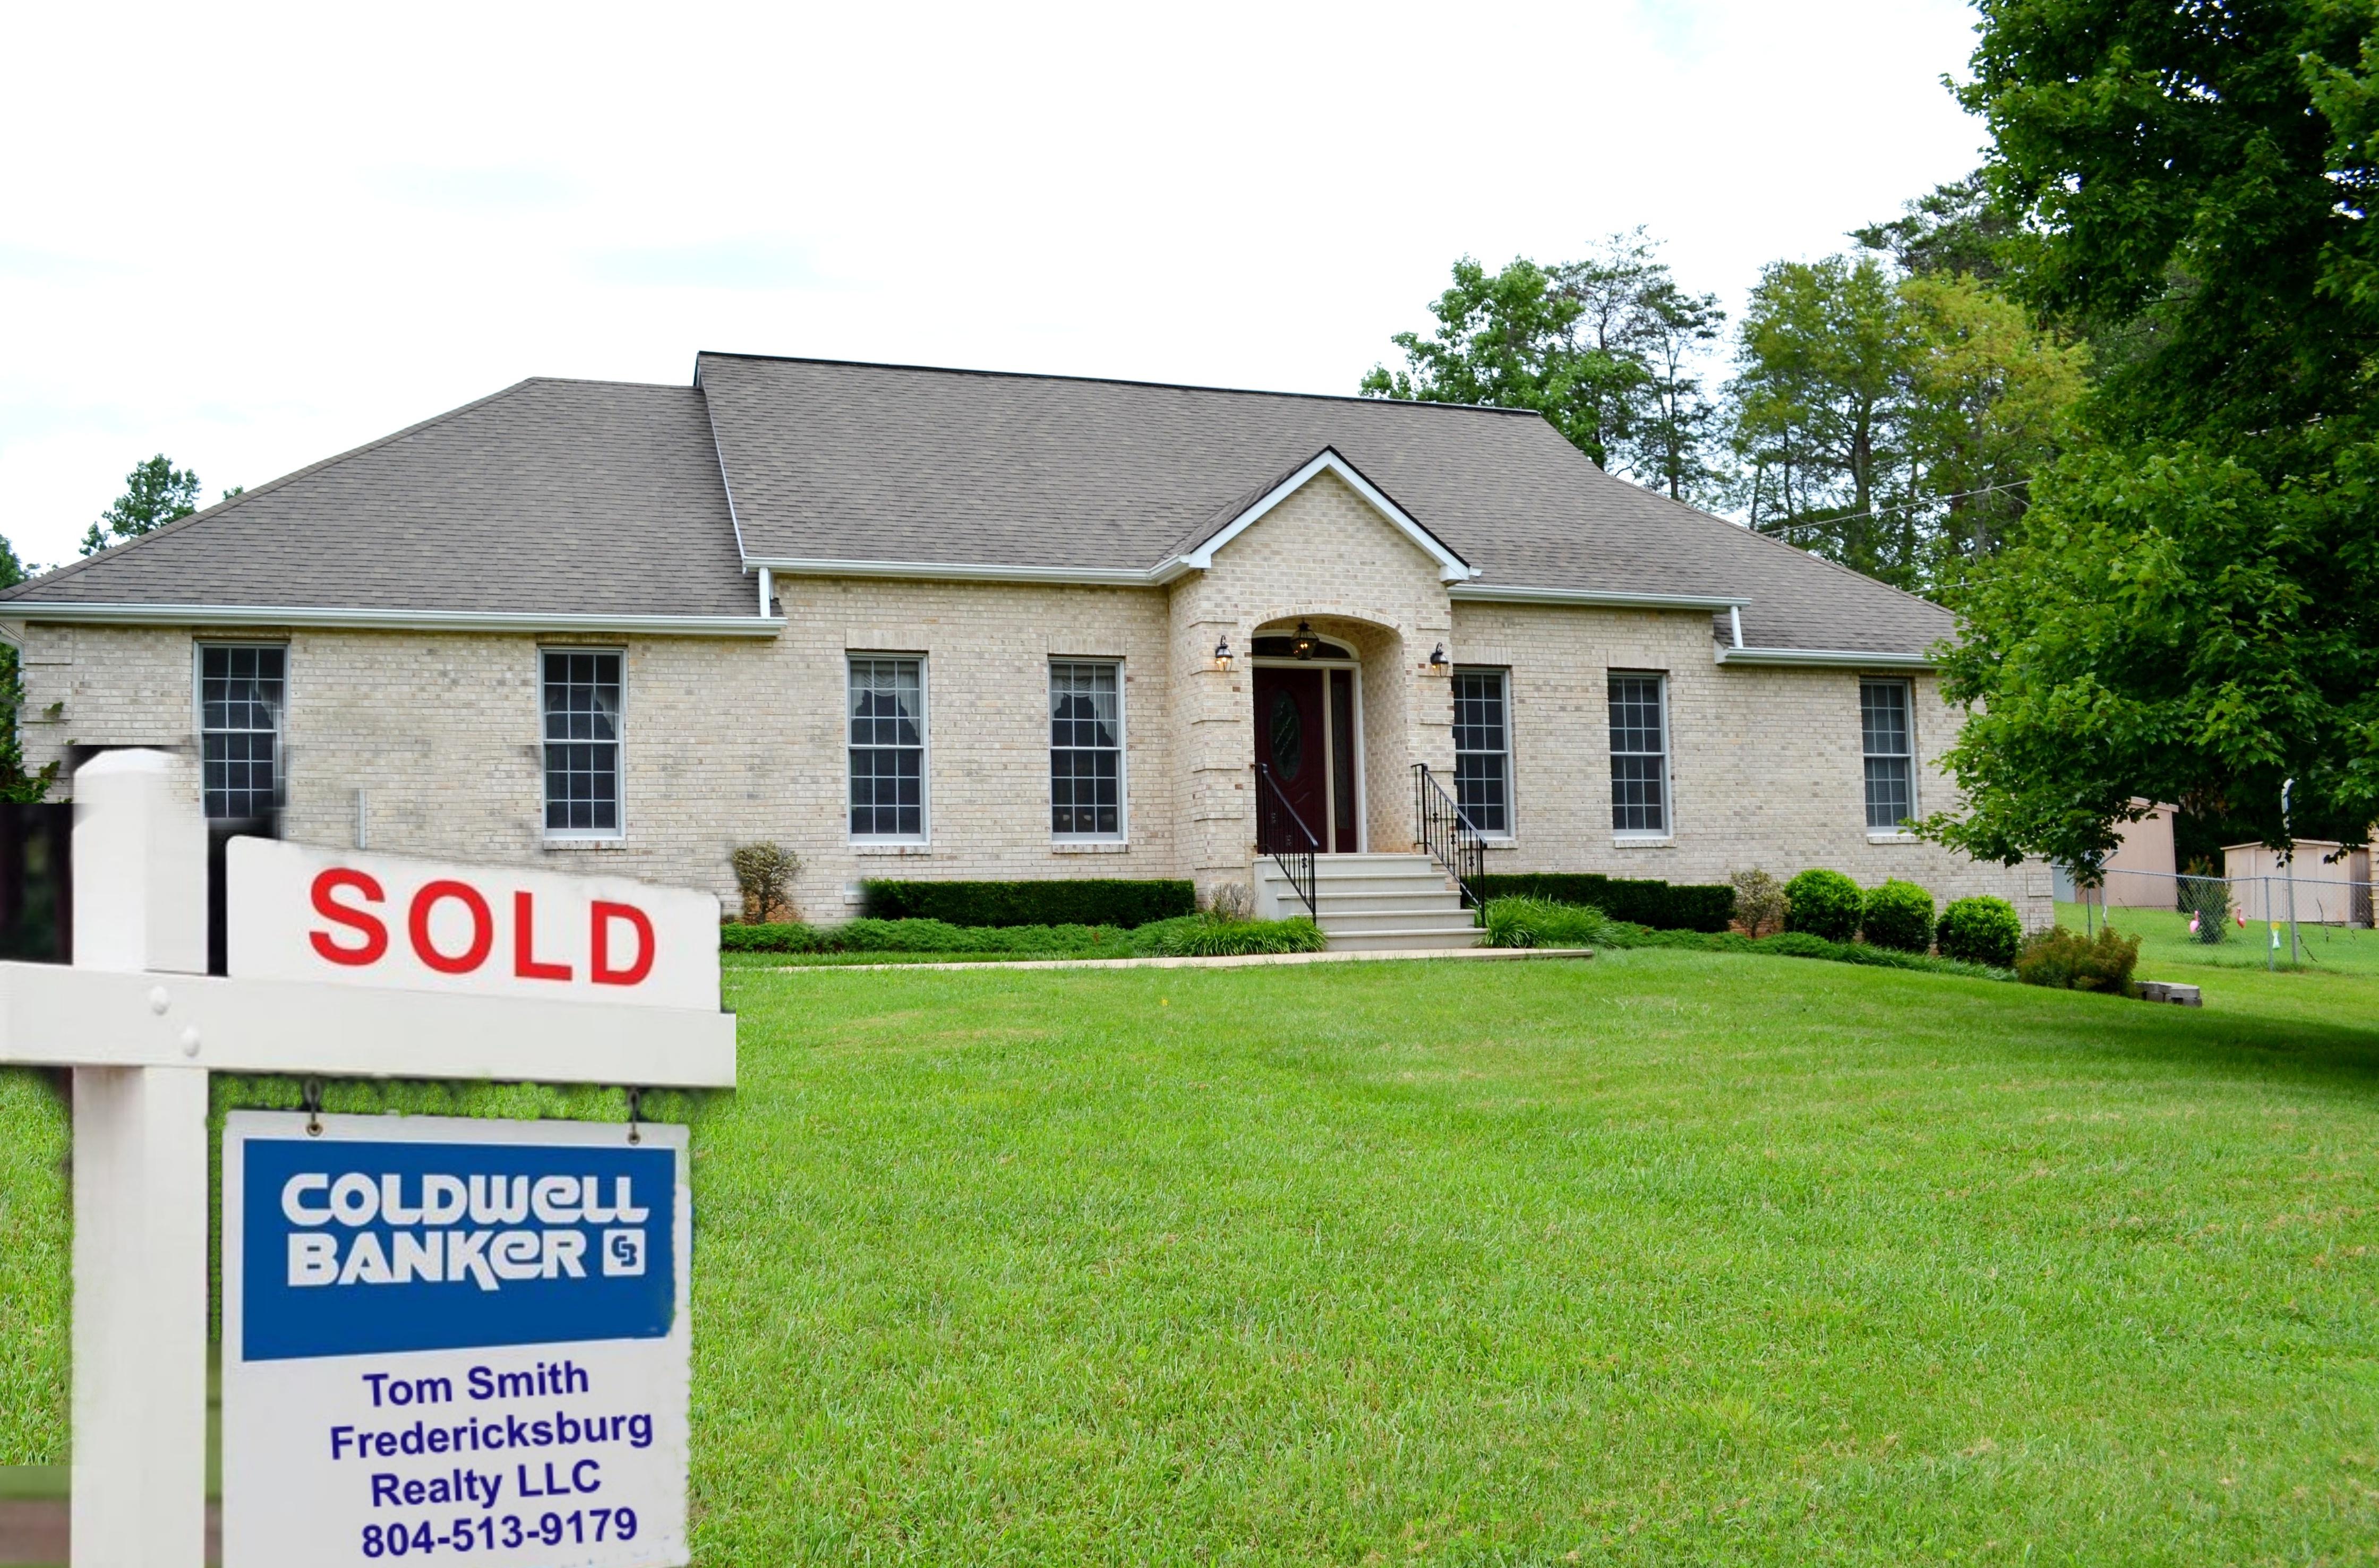 Fredericksburg Area market reports sold home image